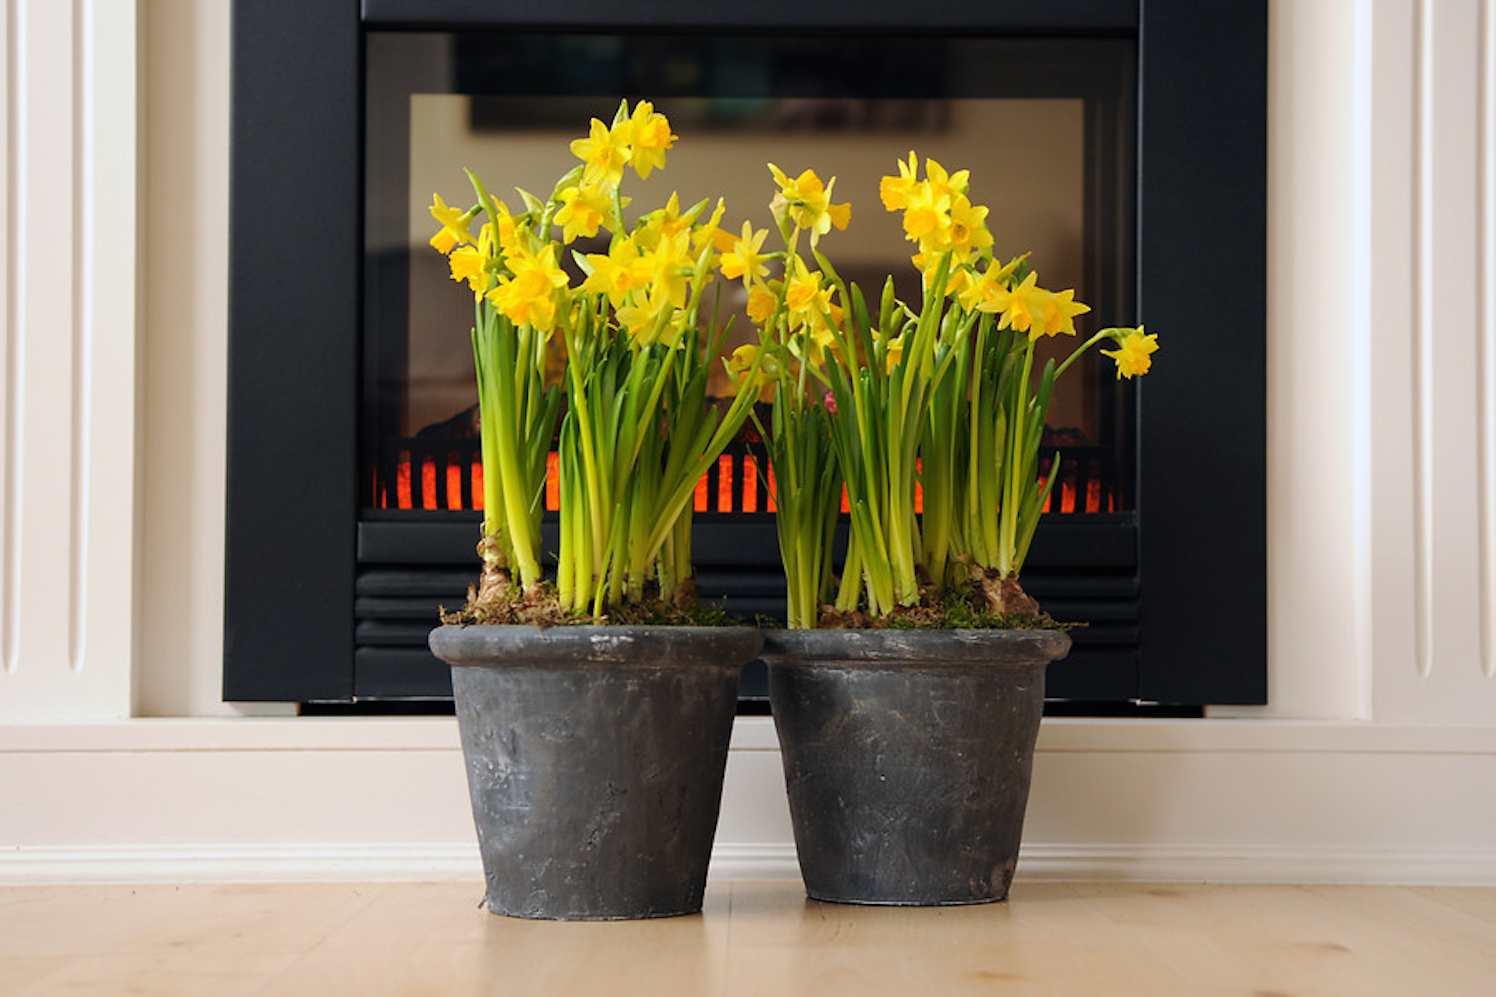 Plantenlijst Robs Grote Tuinverbouwing 0701  GroenVandaag